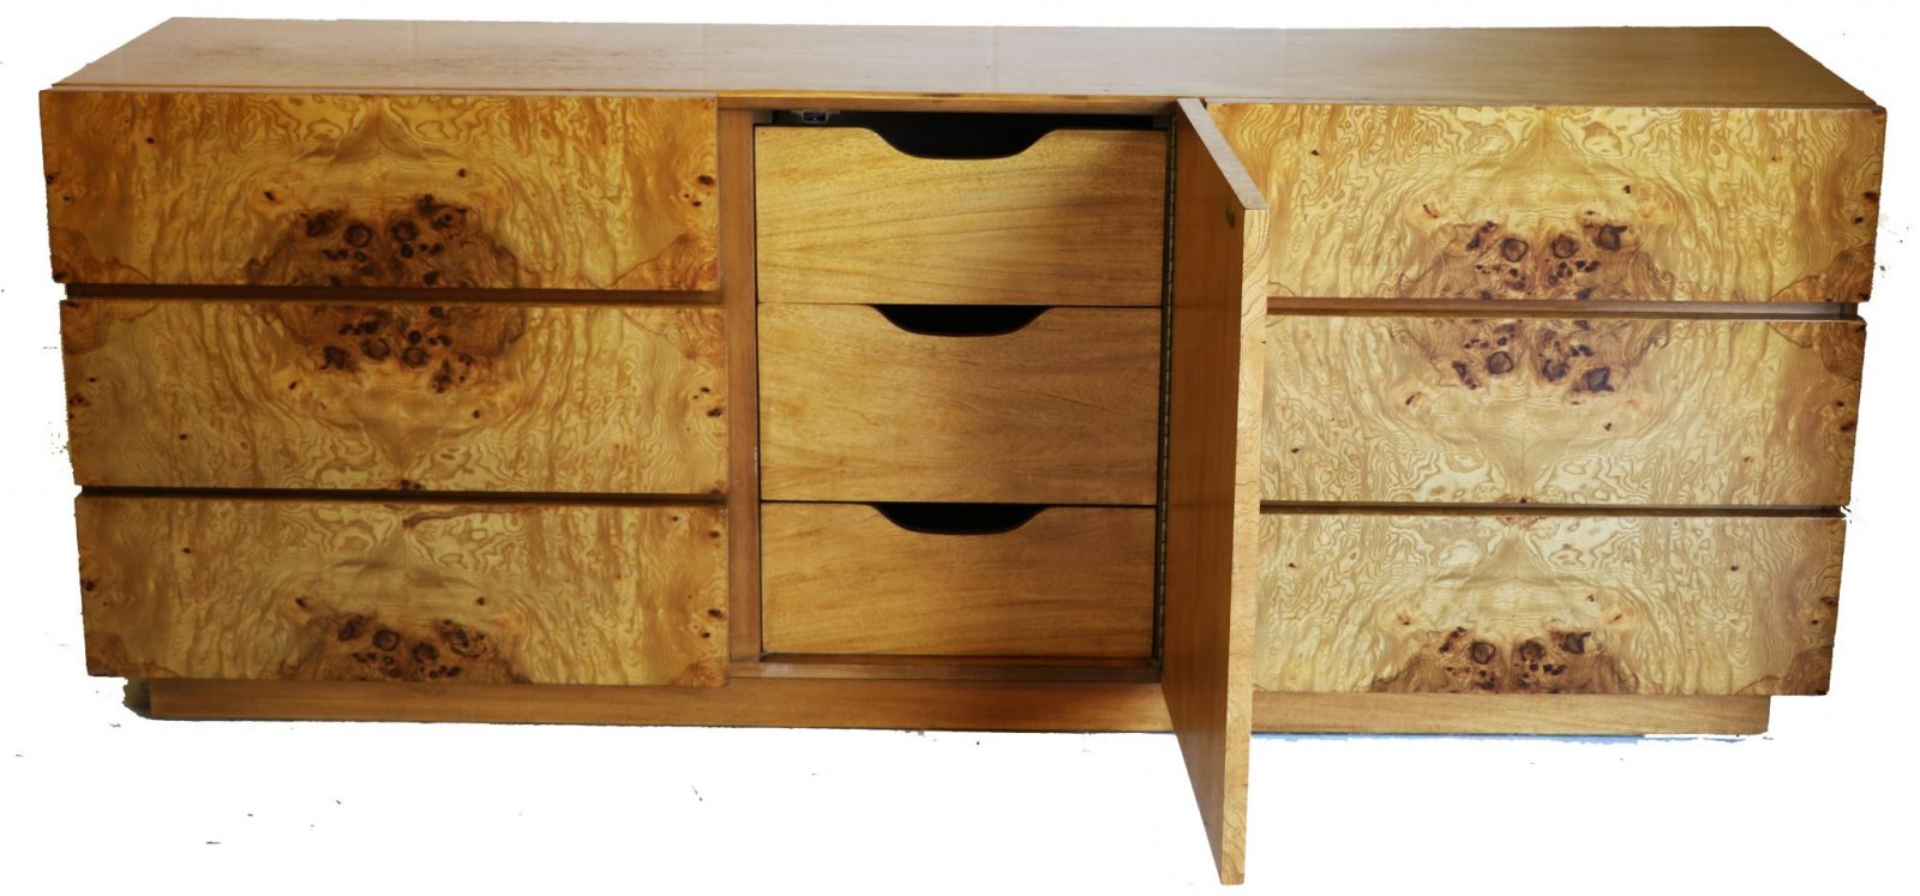 Burl Wood Dresser By Milo Baughman For Lane Usa 1970s